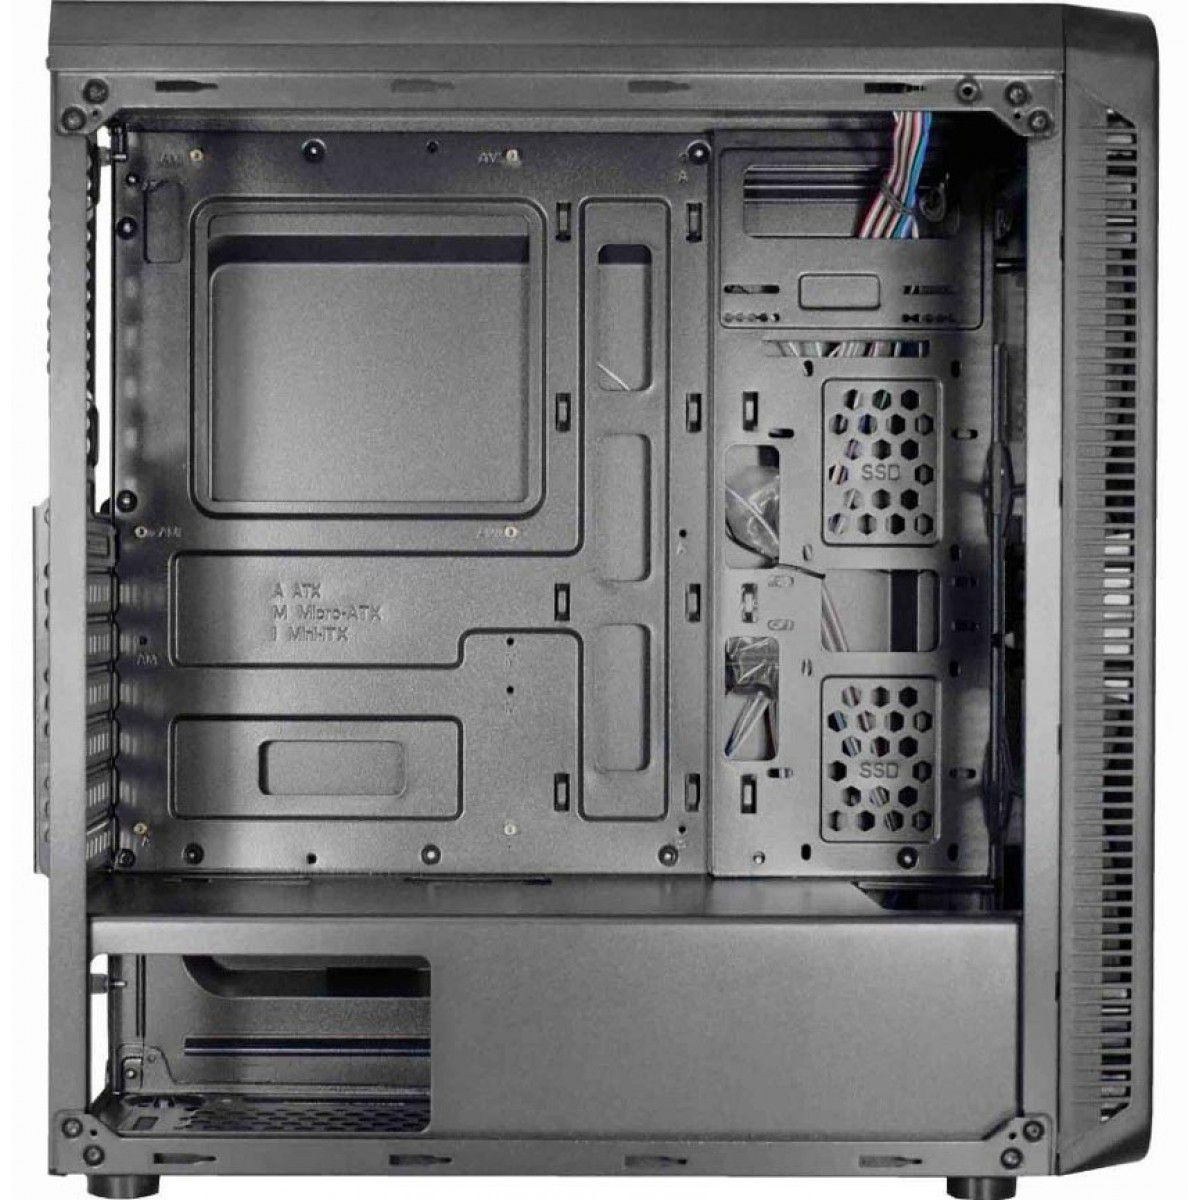 Gabinete Gamer KMex Infinity 5 Cg-05g8 RGB 3 Coolers + Fita